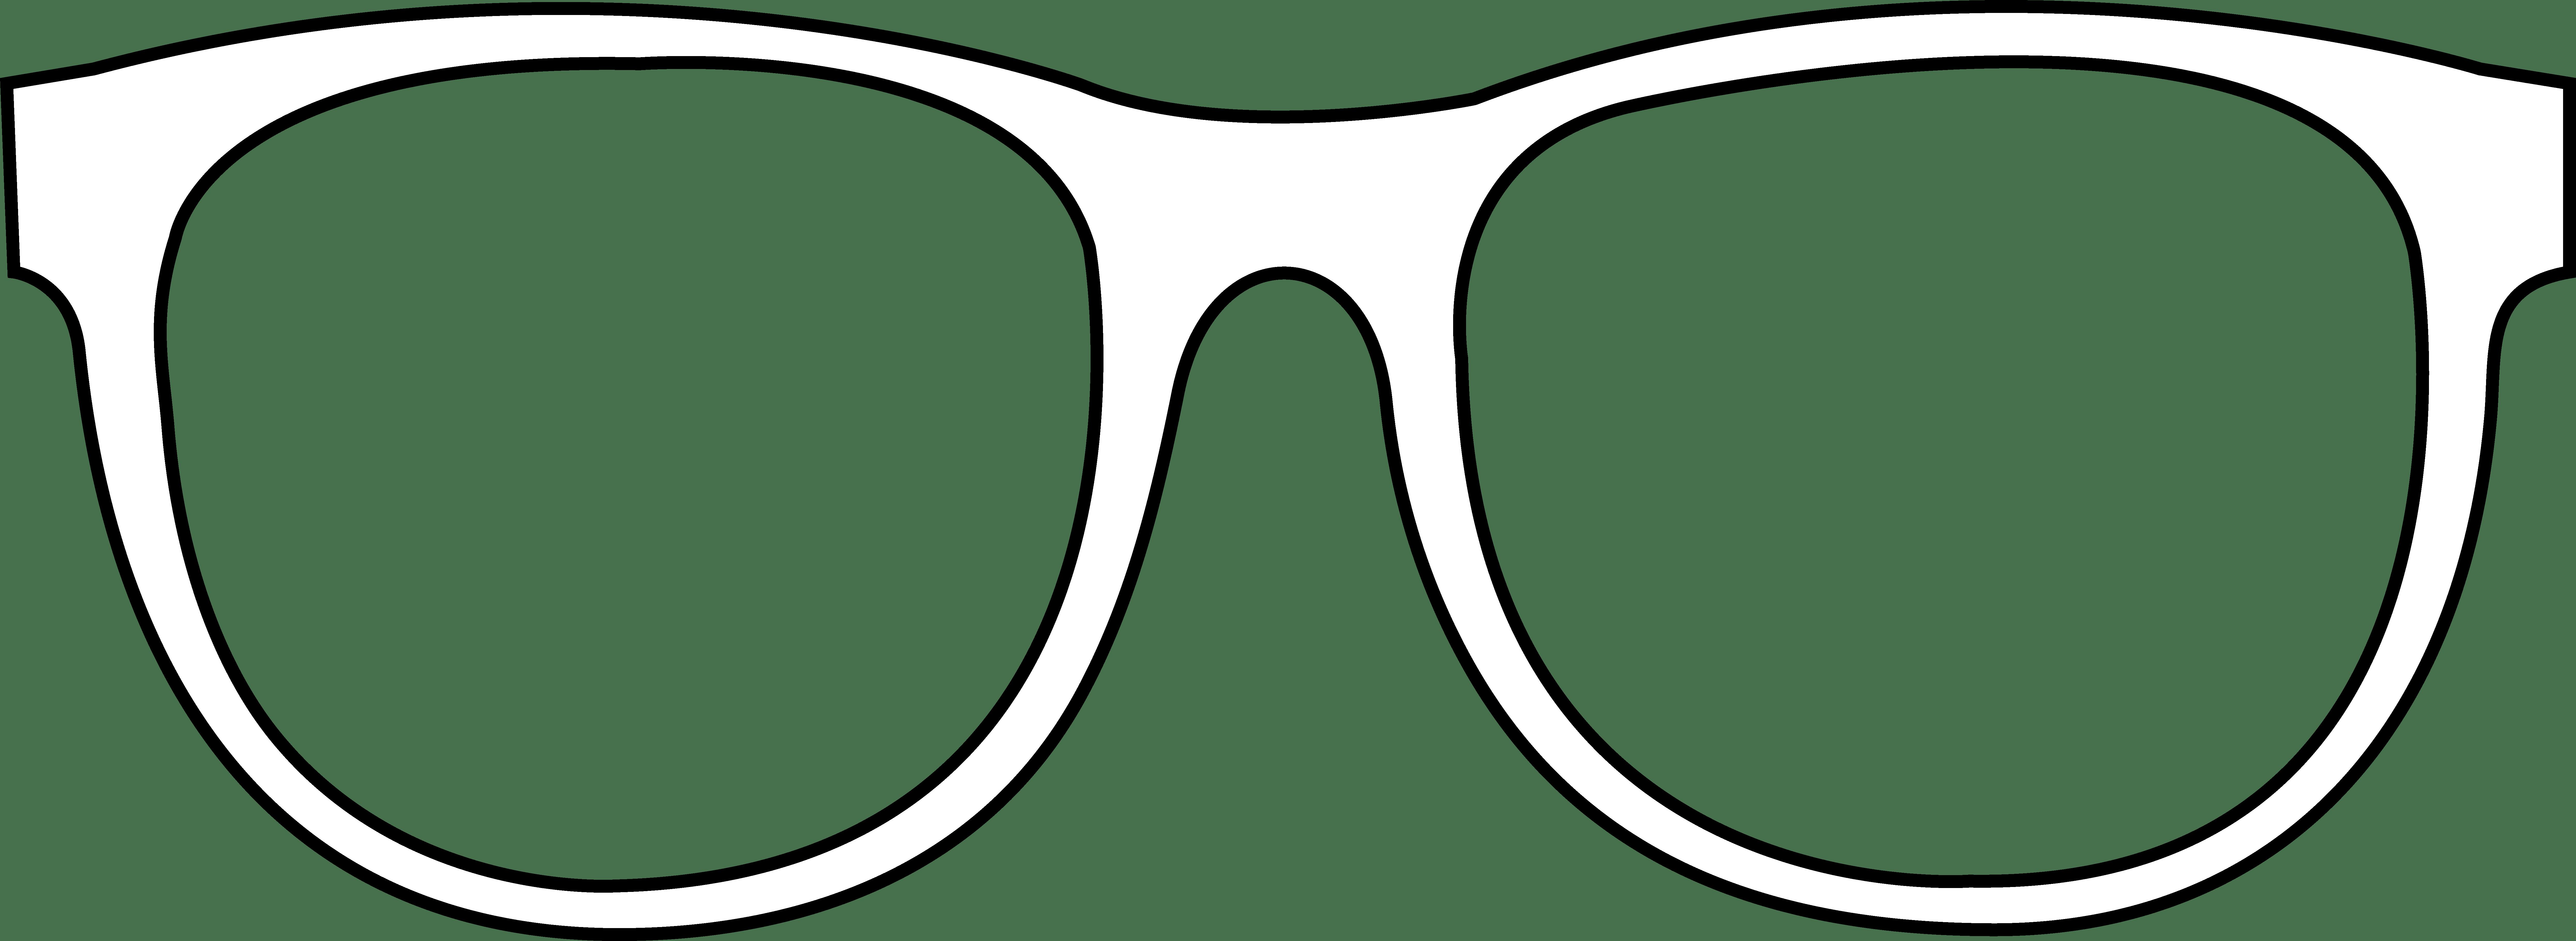 Nerd Glasses Clipart